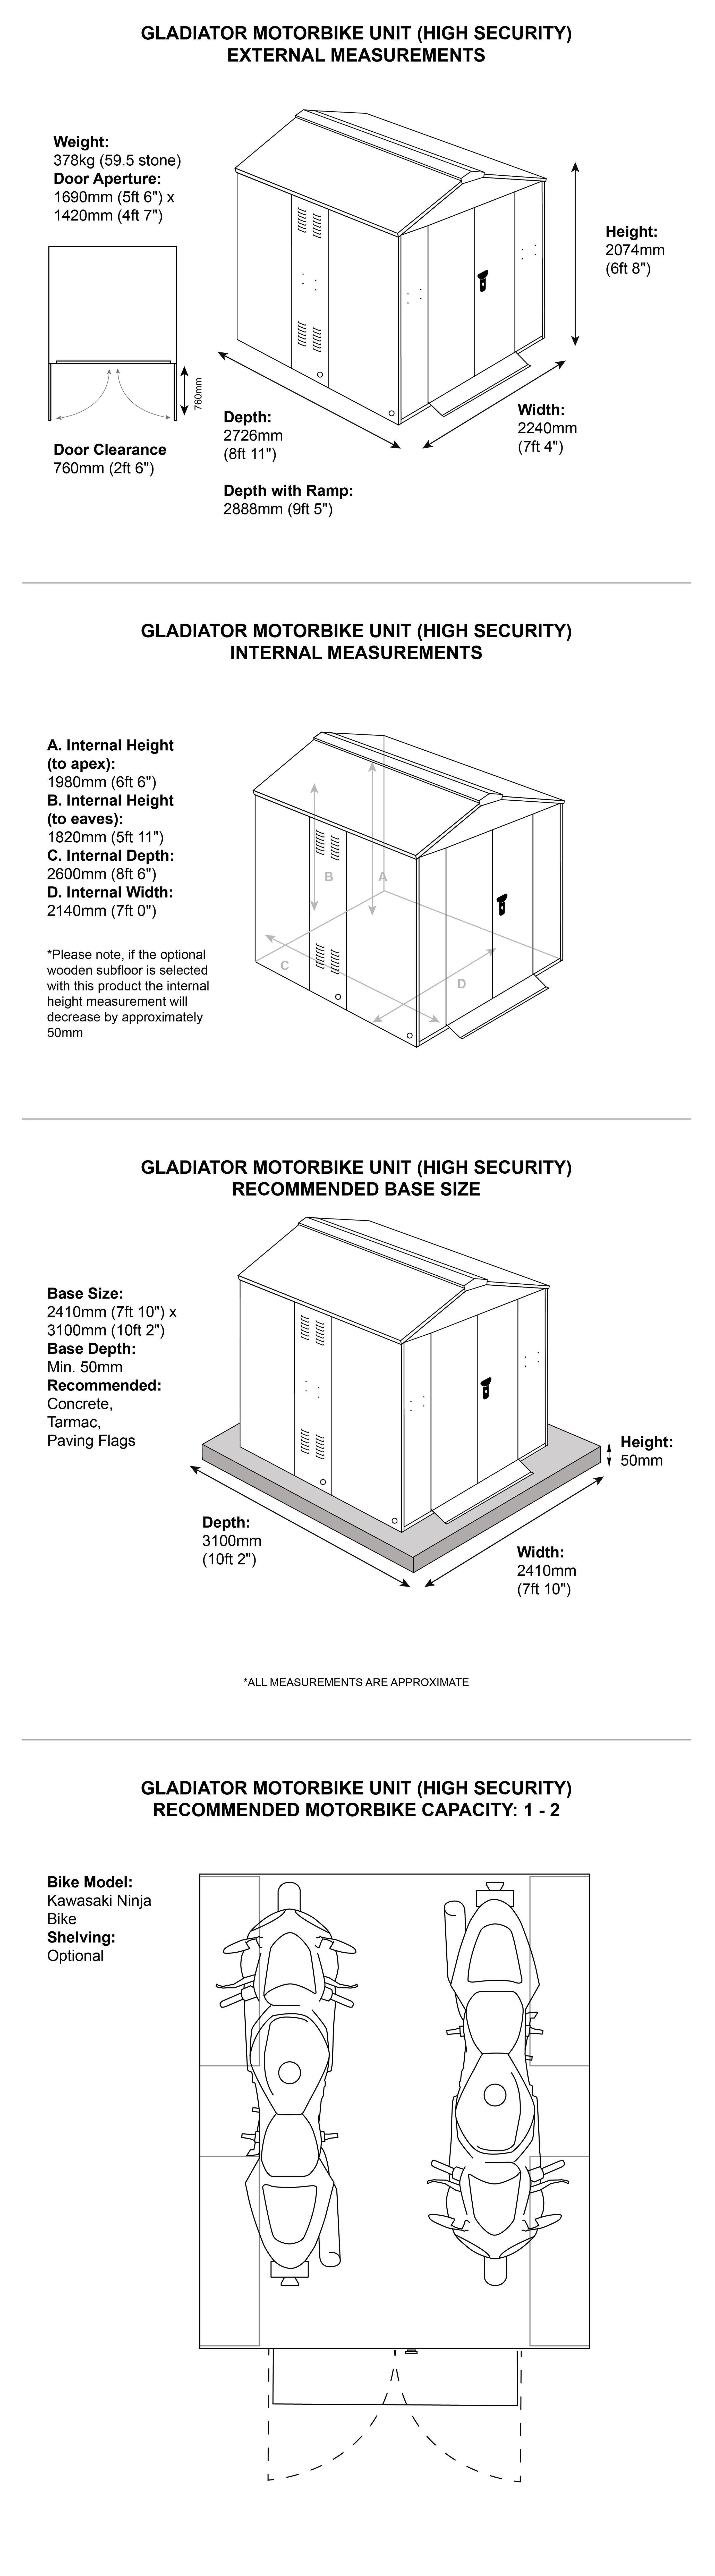 Gladiator Motorbike storage from Asgard